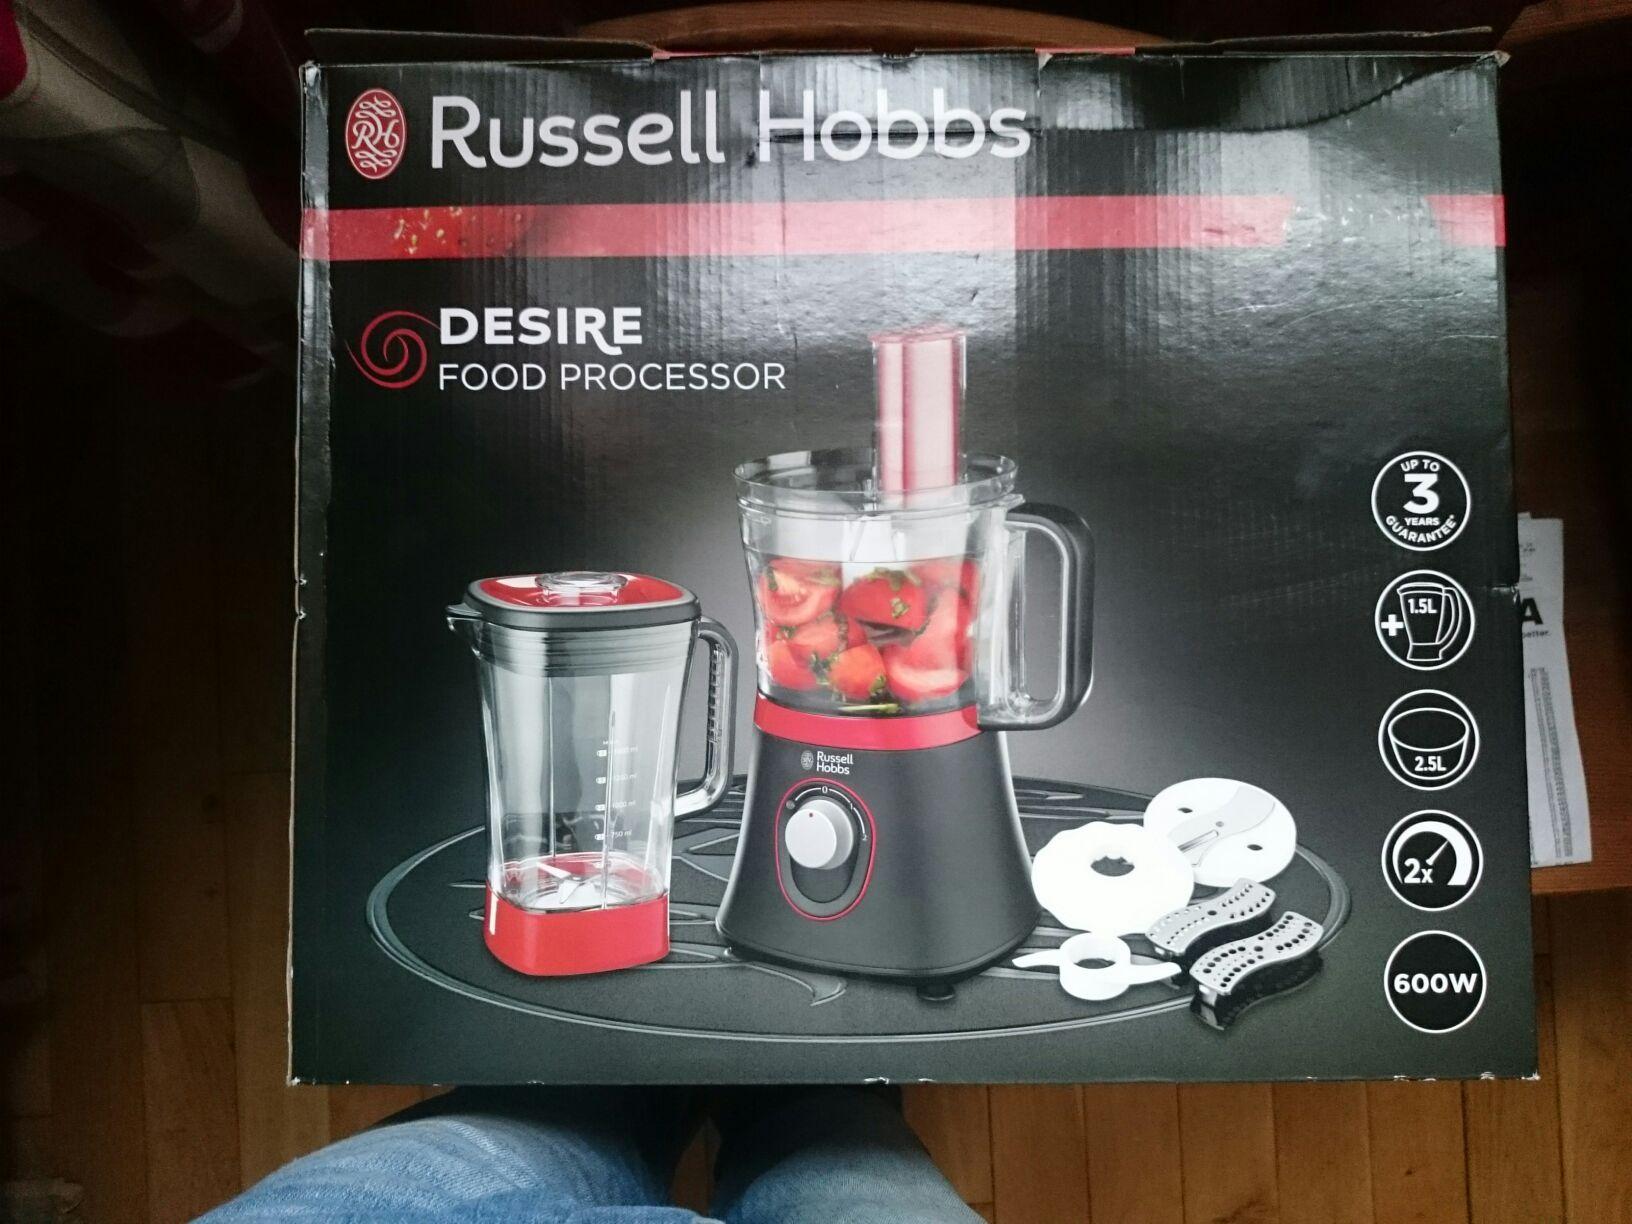 Russell Hobbs Desire food processor 18511 £24.70 @ Asda - Bromsgrove